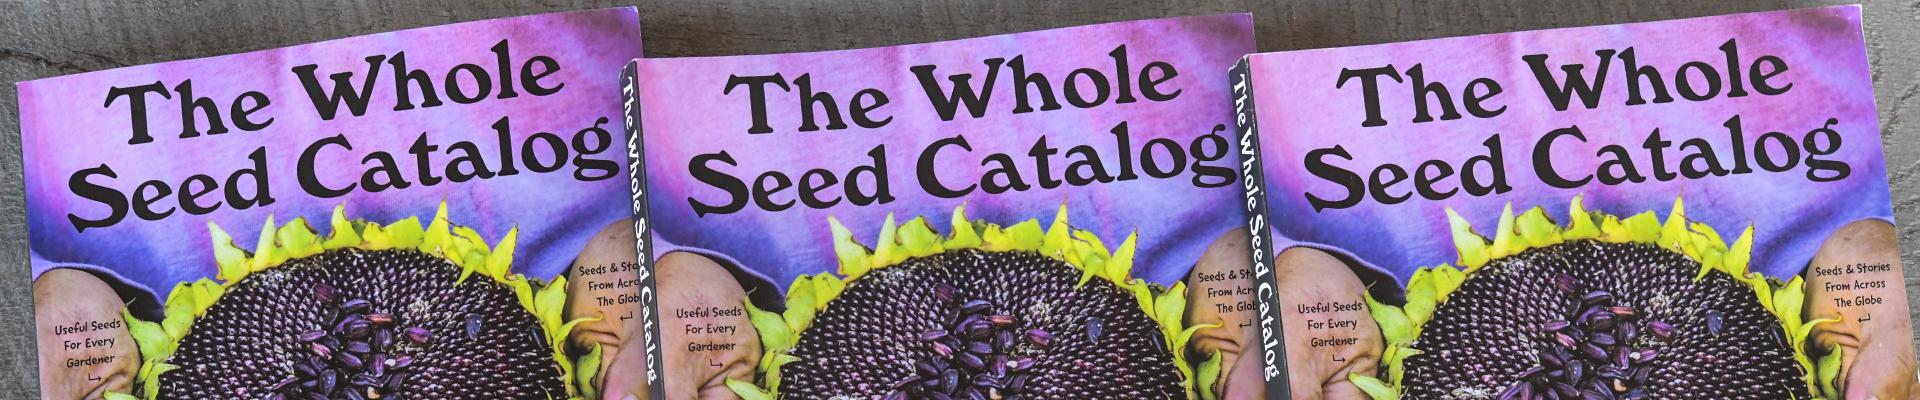 Whole Seed Catalog